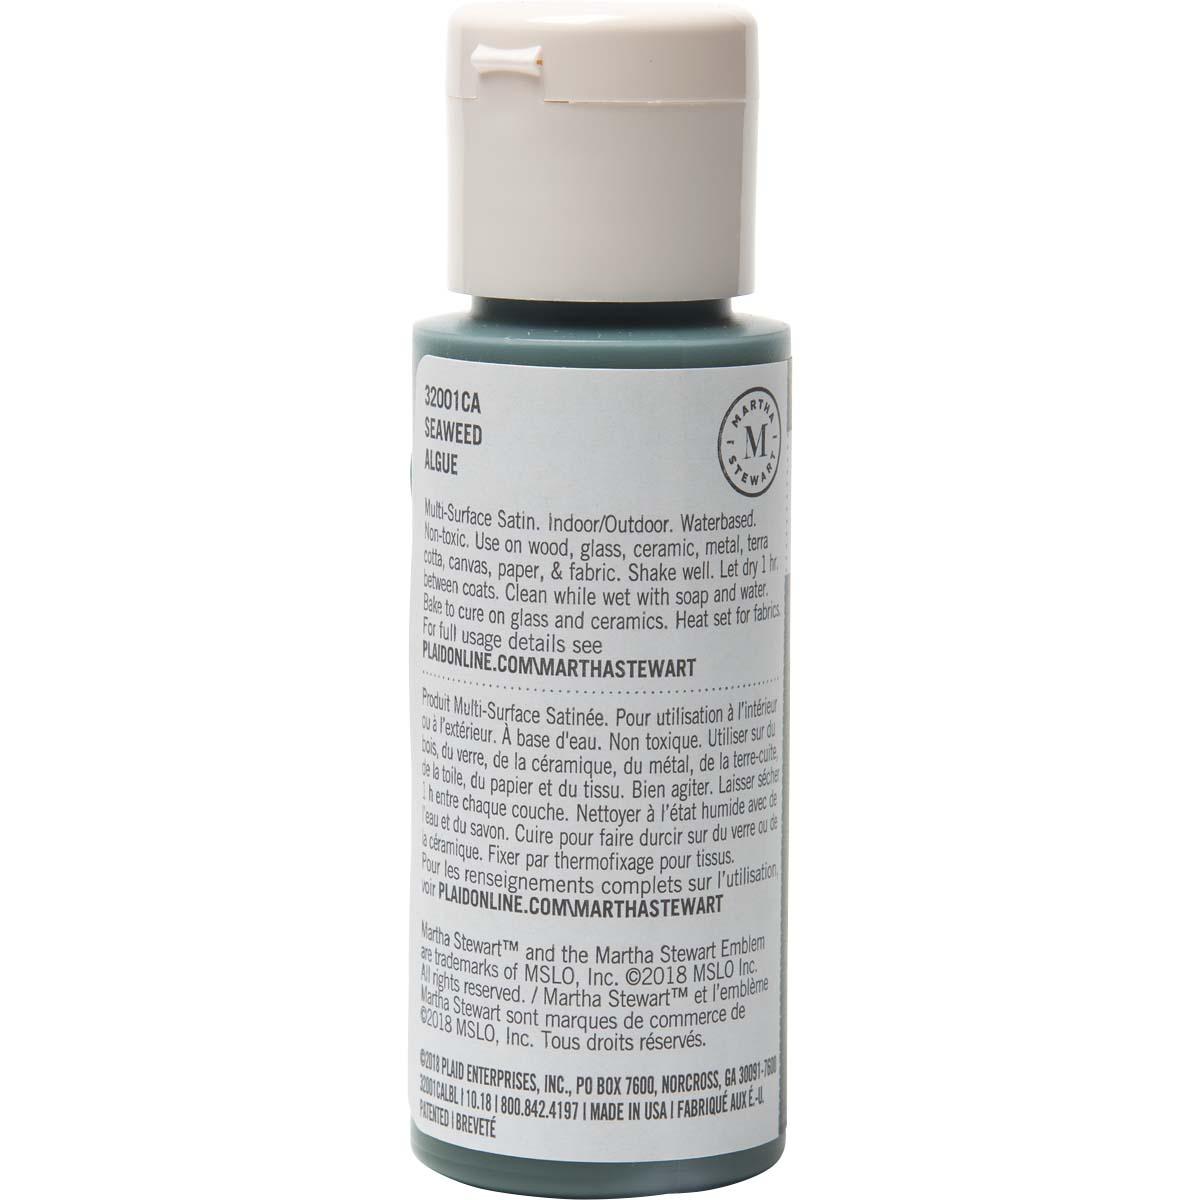 Martha Stewart ® Multi-Surface Satin Acrylic Craft Paint - Seaweed, 2 oz.